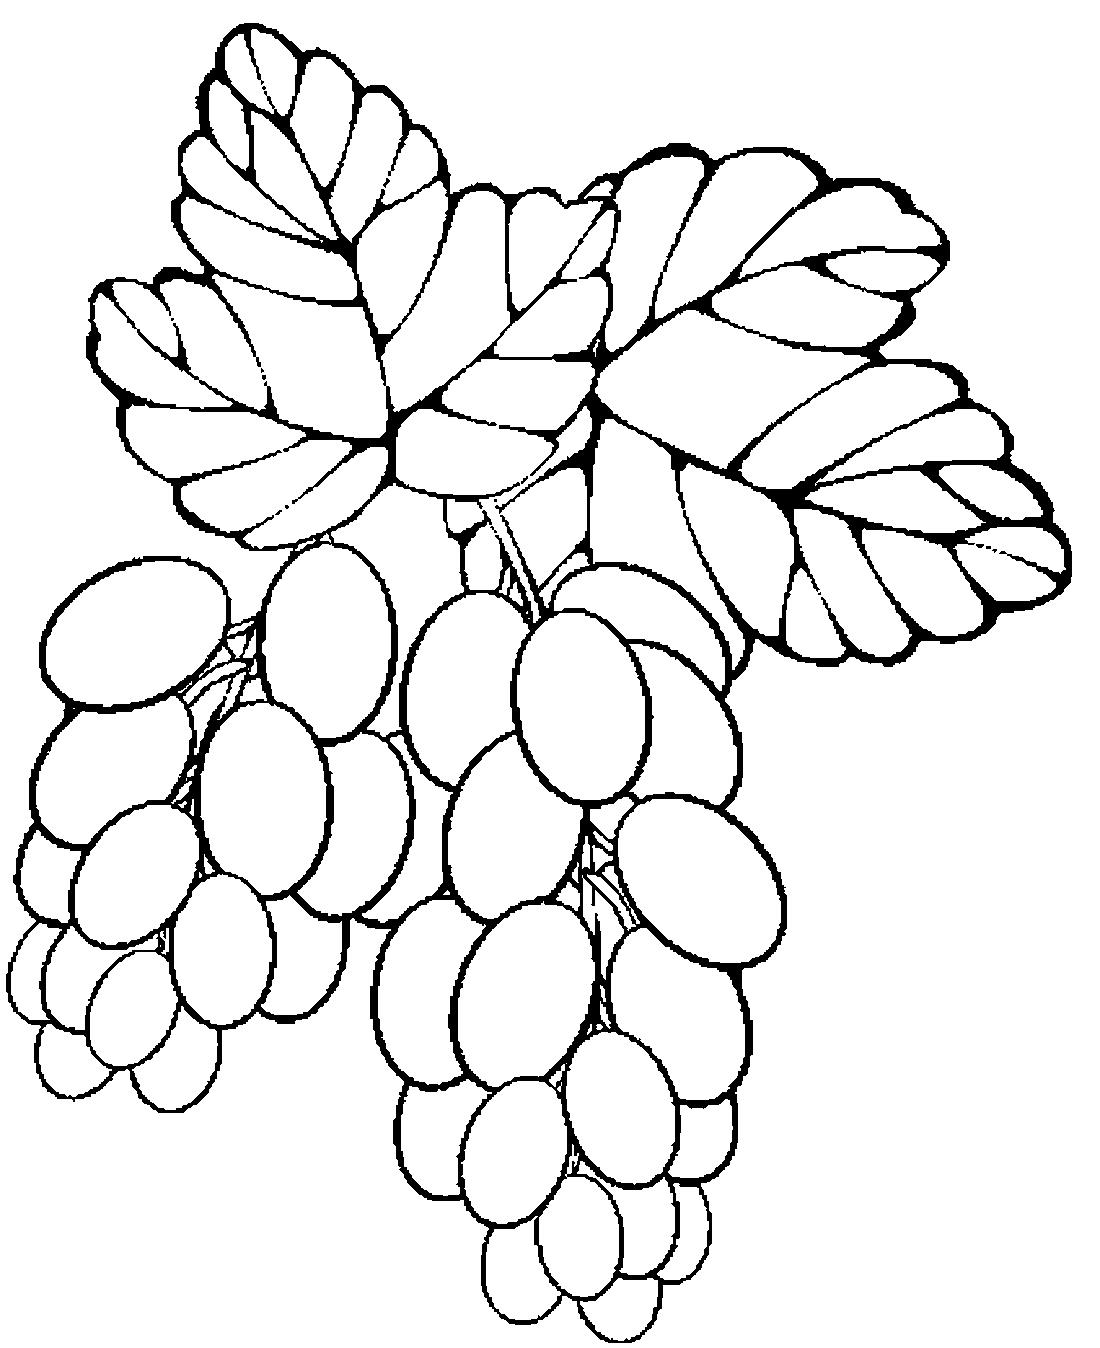 Картинки раскраски виноград